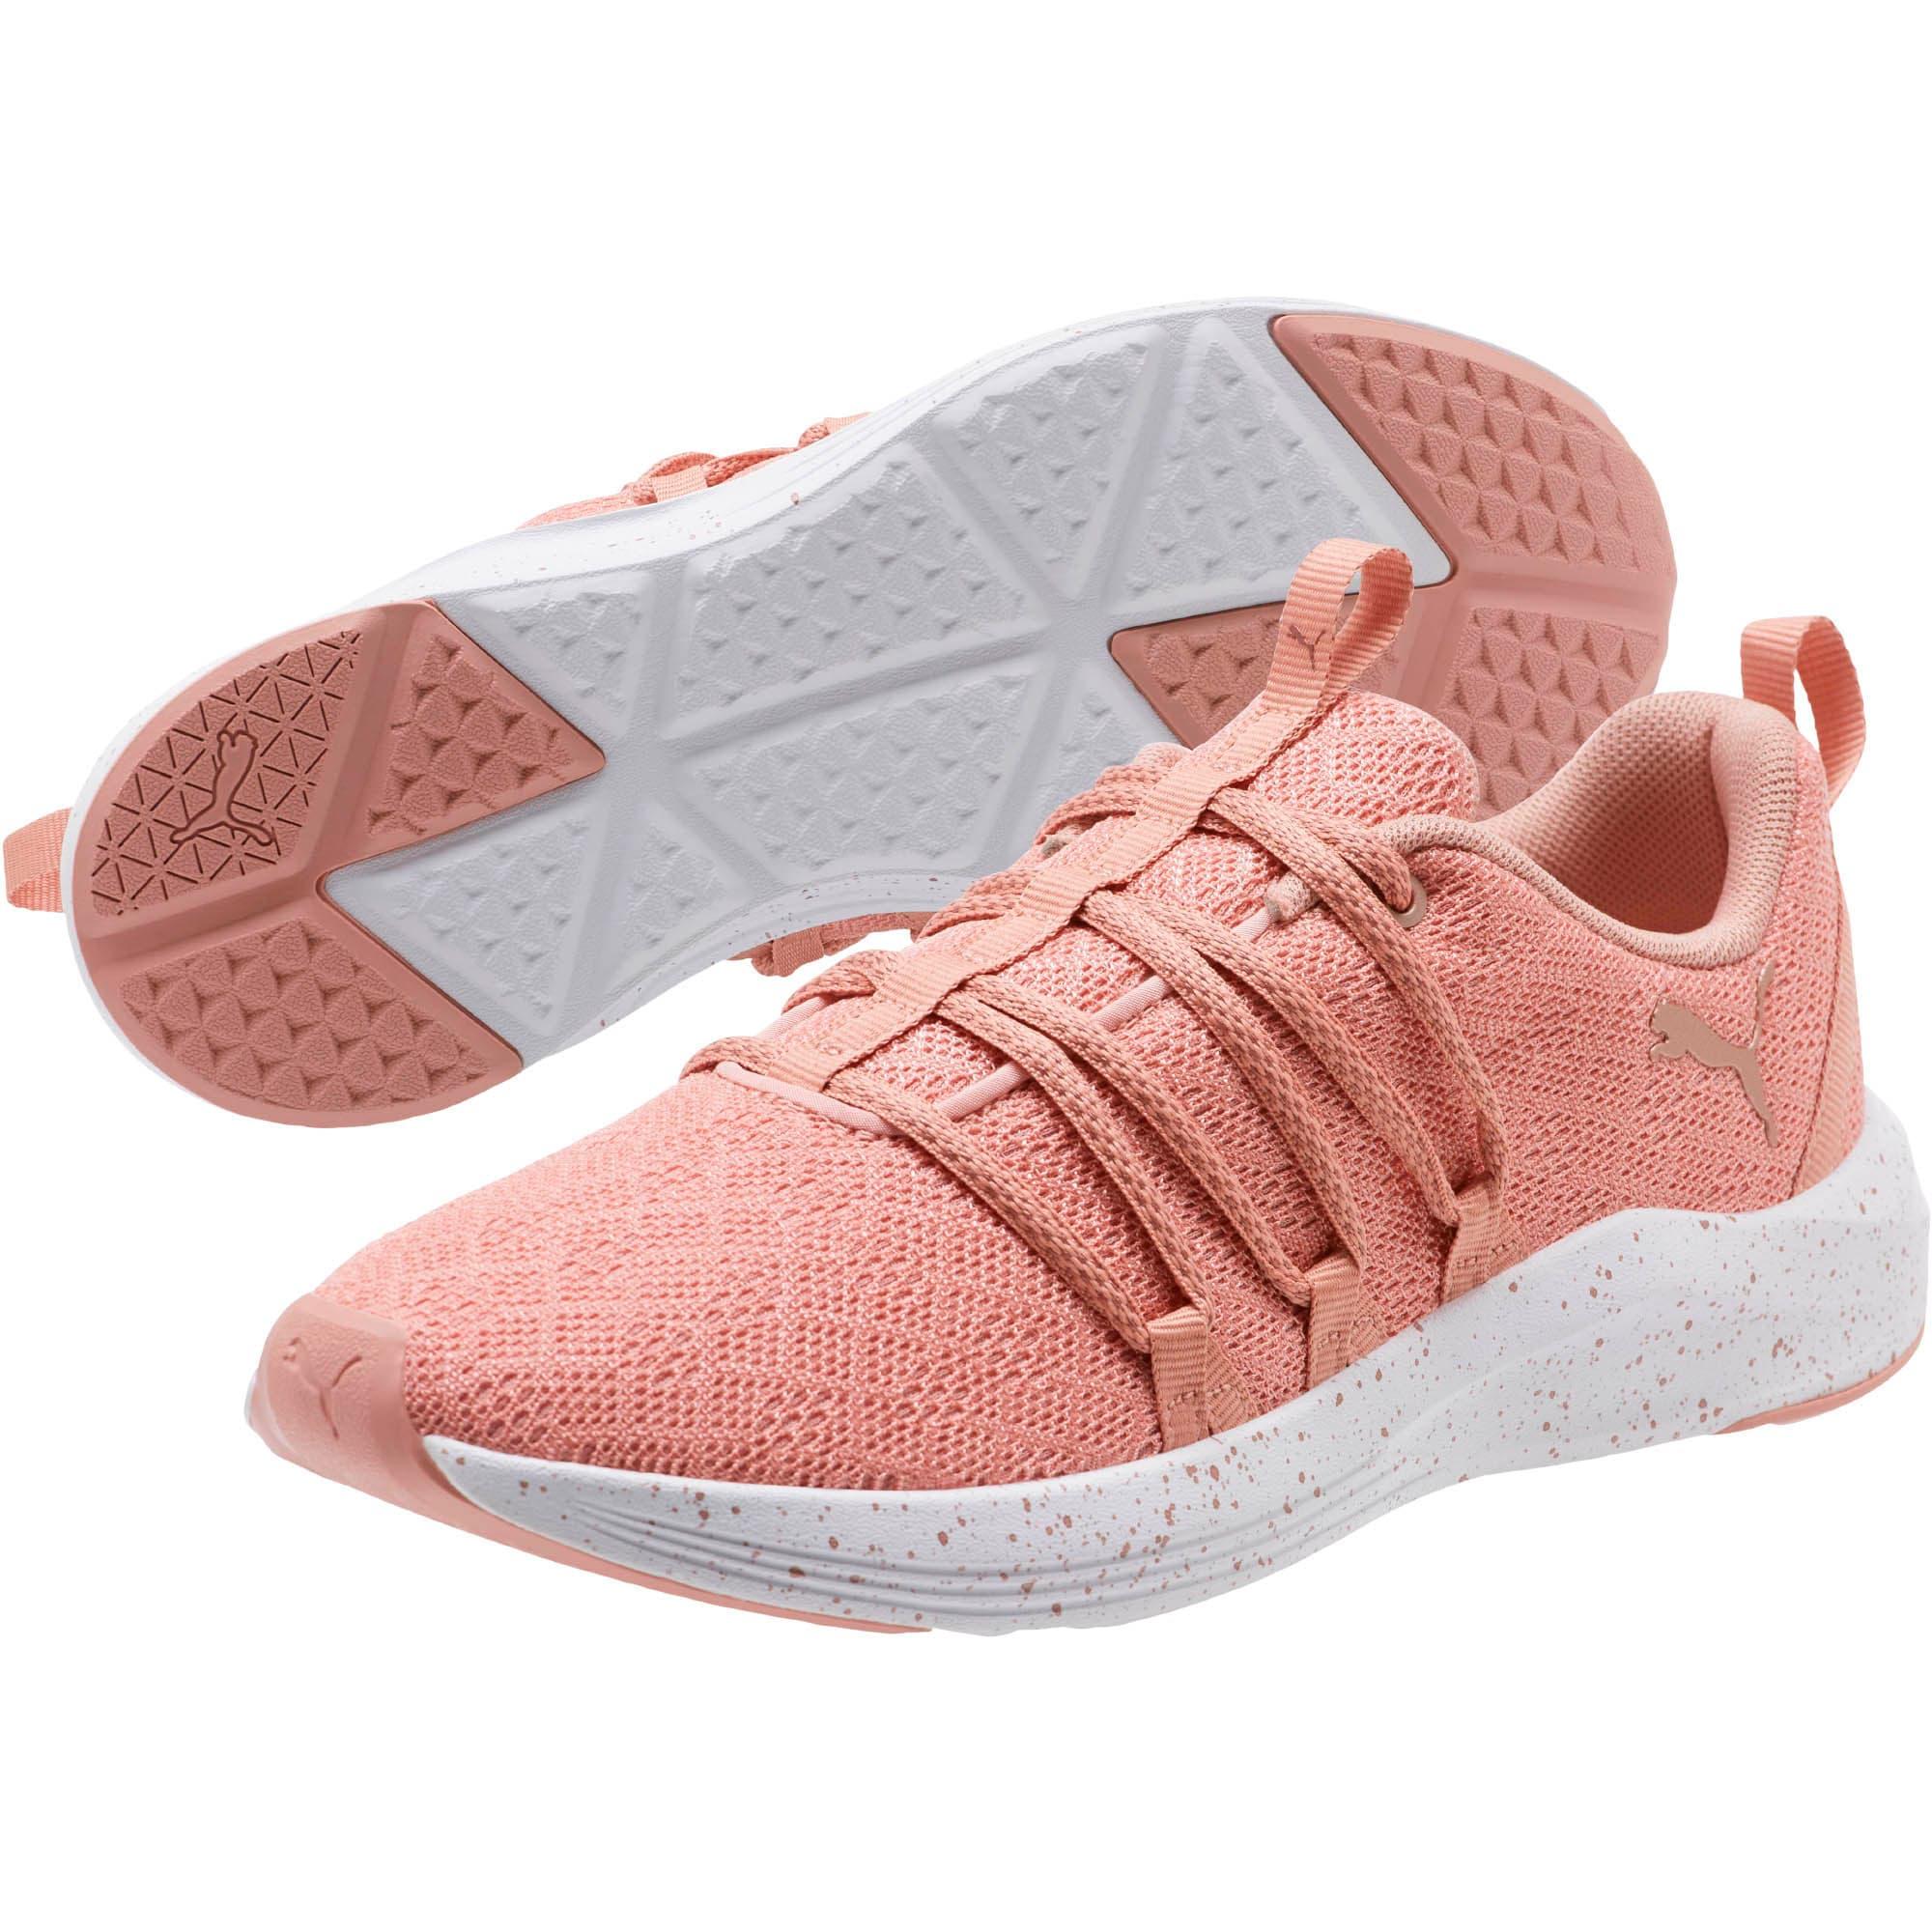 Thumbnail 2 of Prowl Alt Mesh Speckle Women's Training Shoes, Peach Beige-Puma White, medium